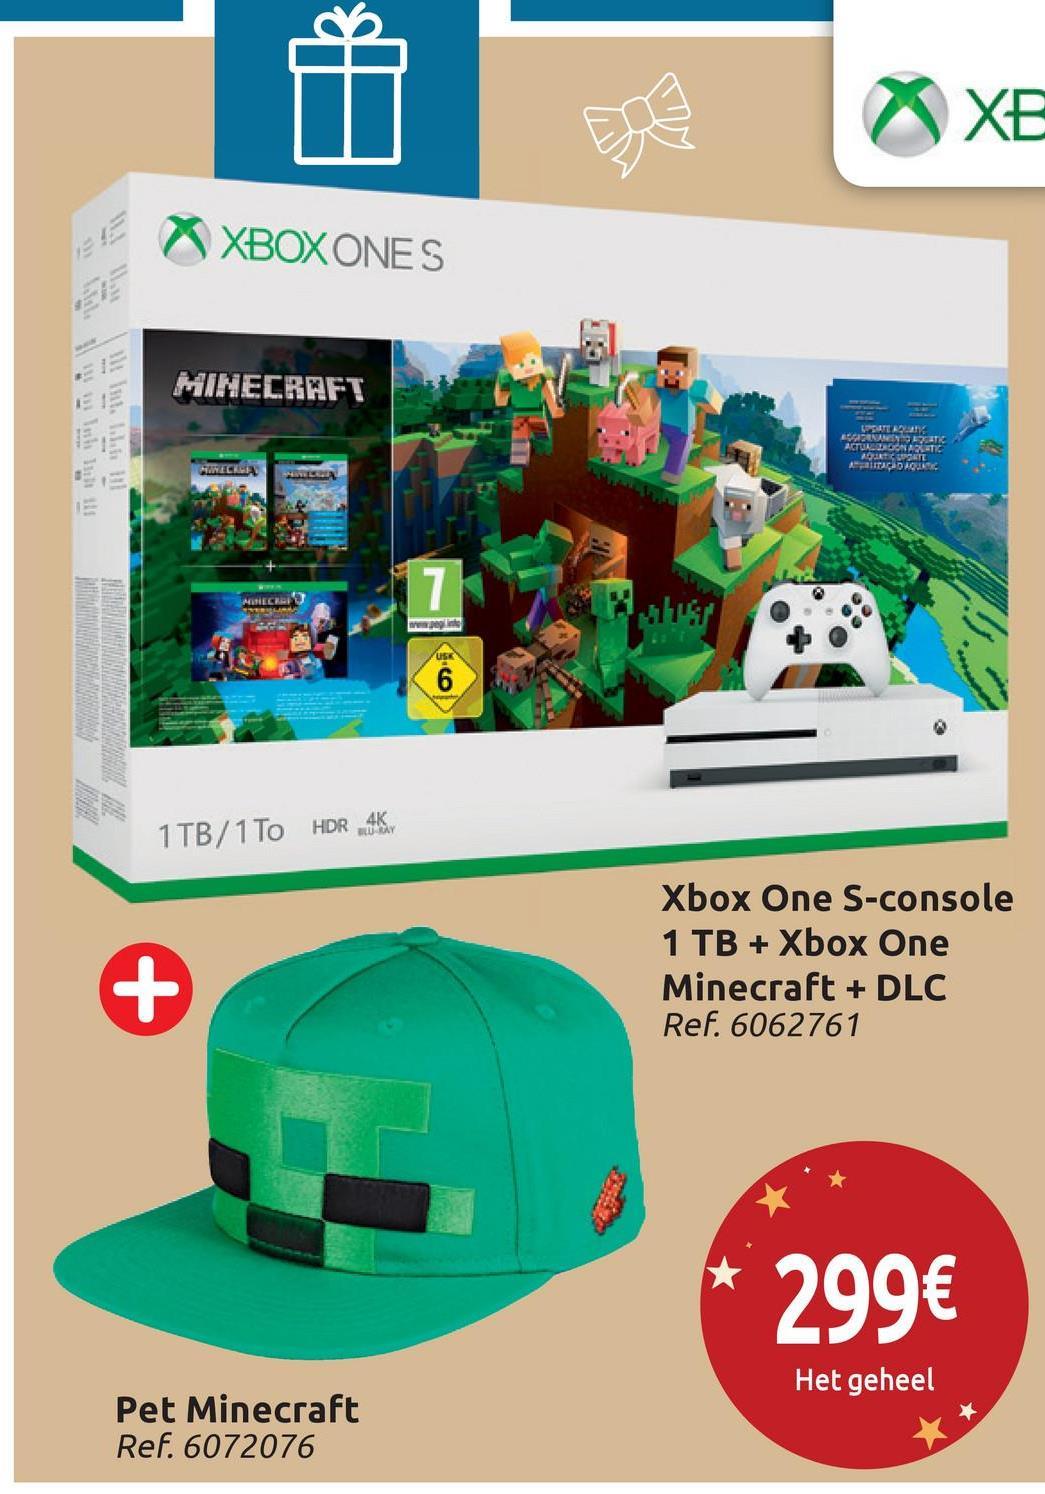 XBOXONES MINECRAFT USATE ANAS ACTUALDORABLETIC Awalitako hoc peg 1 TB/1 To HDR 4K Xbox One S-console 1 TB + Xbox One Minecraft + DLC Ref. 6062761 299€ Het geheel Pet Minecraft Ref. 6072076